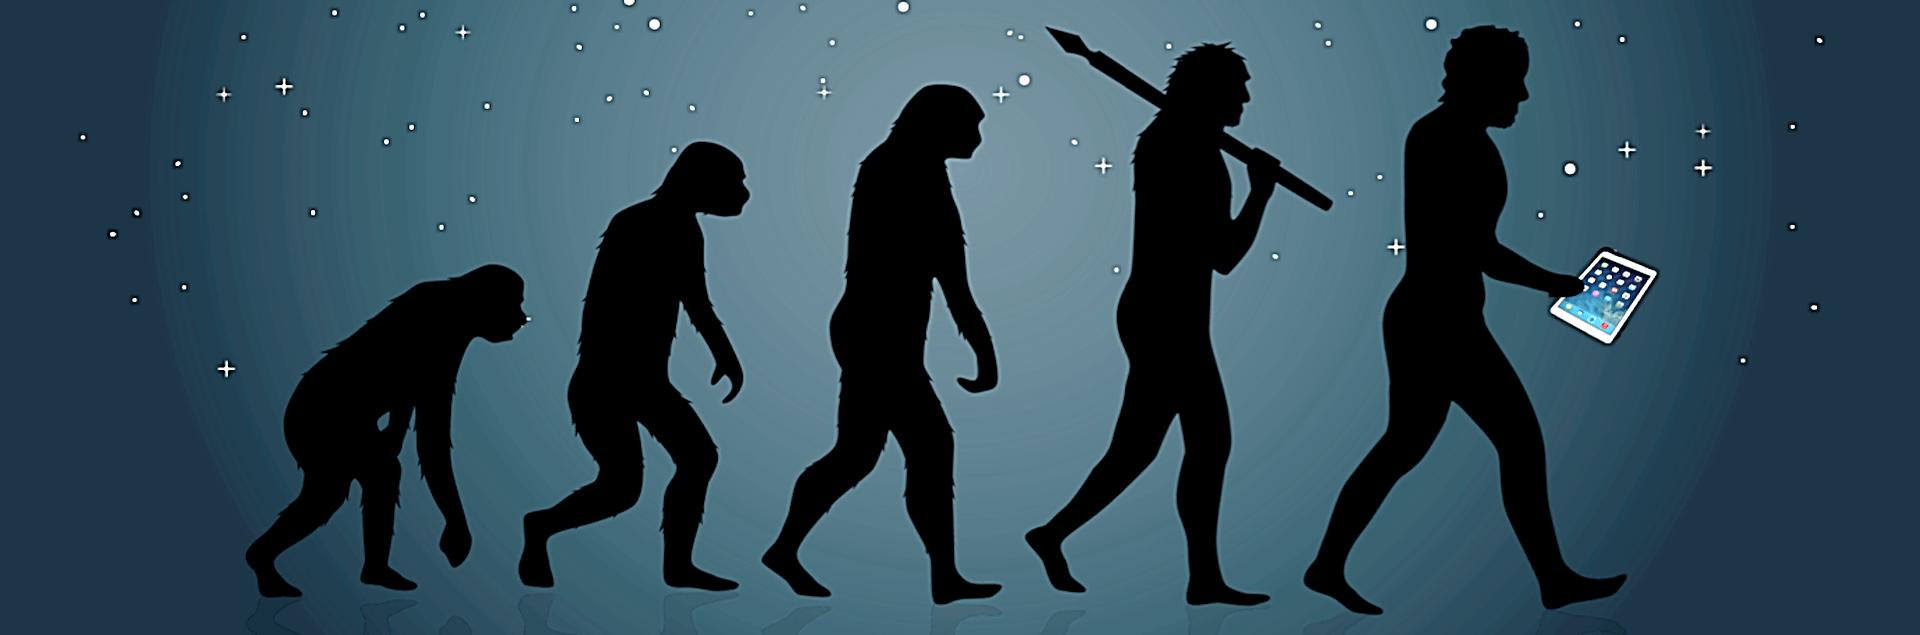 Digital Darwin evolution wipad wide banner -859409-edited